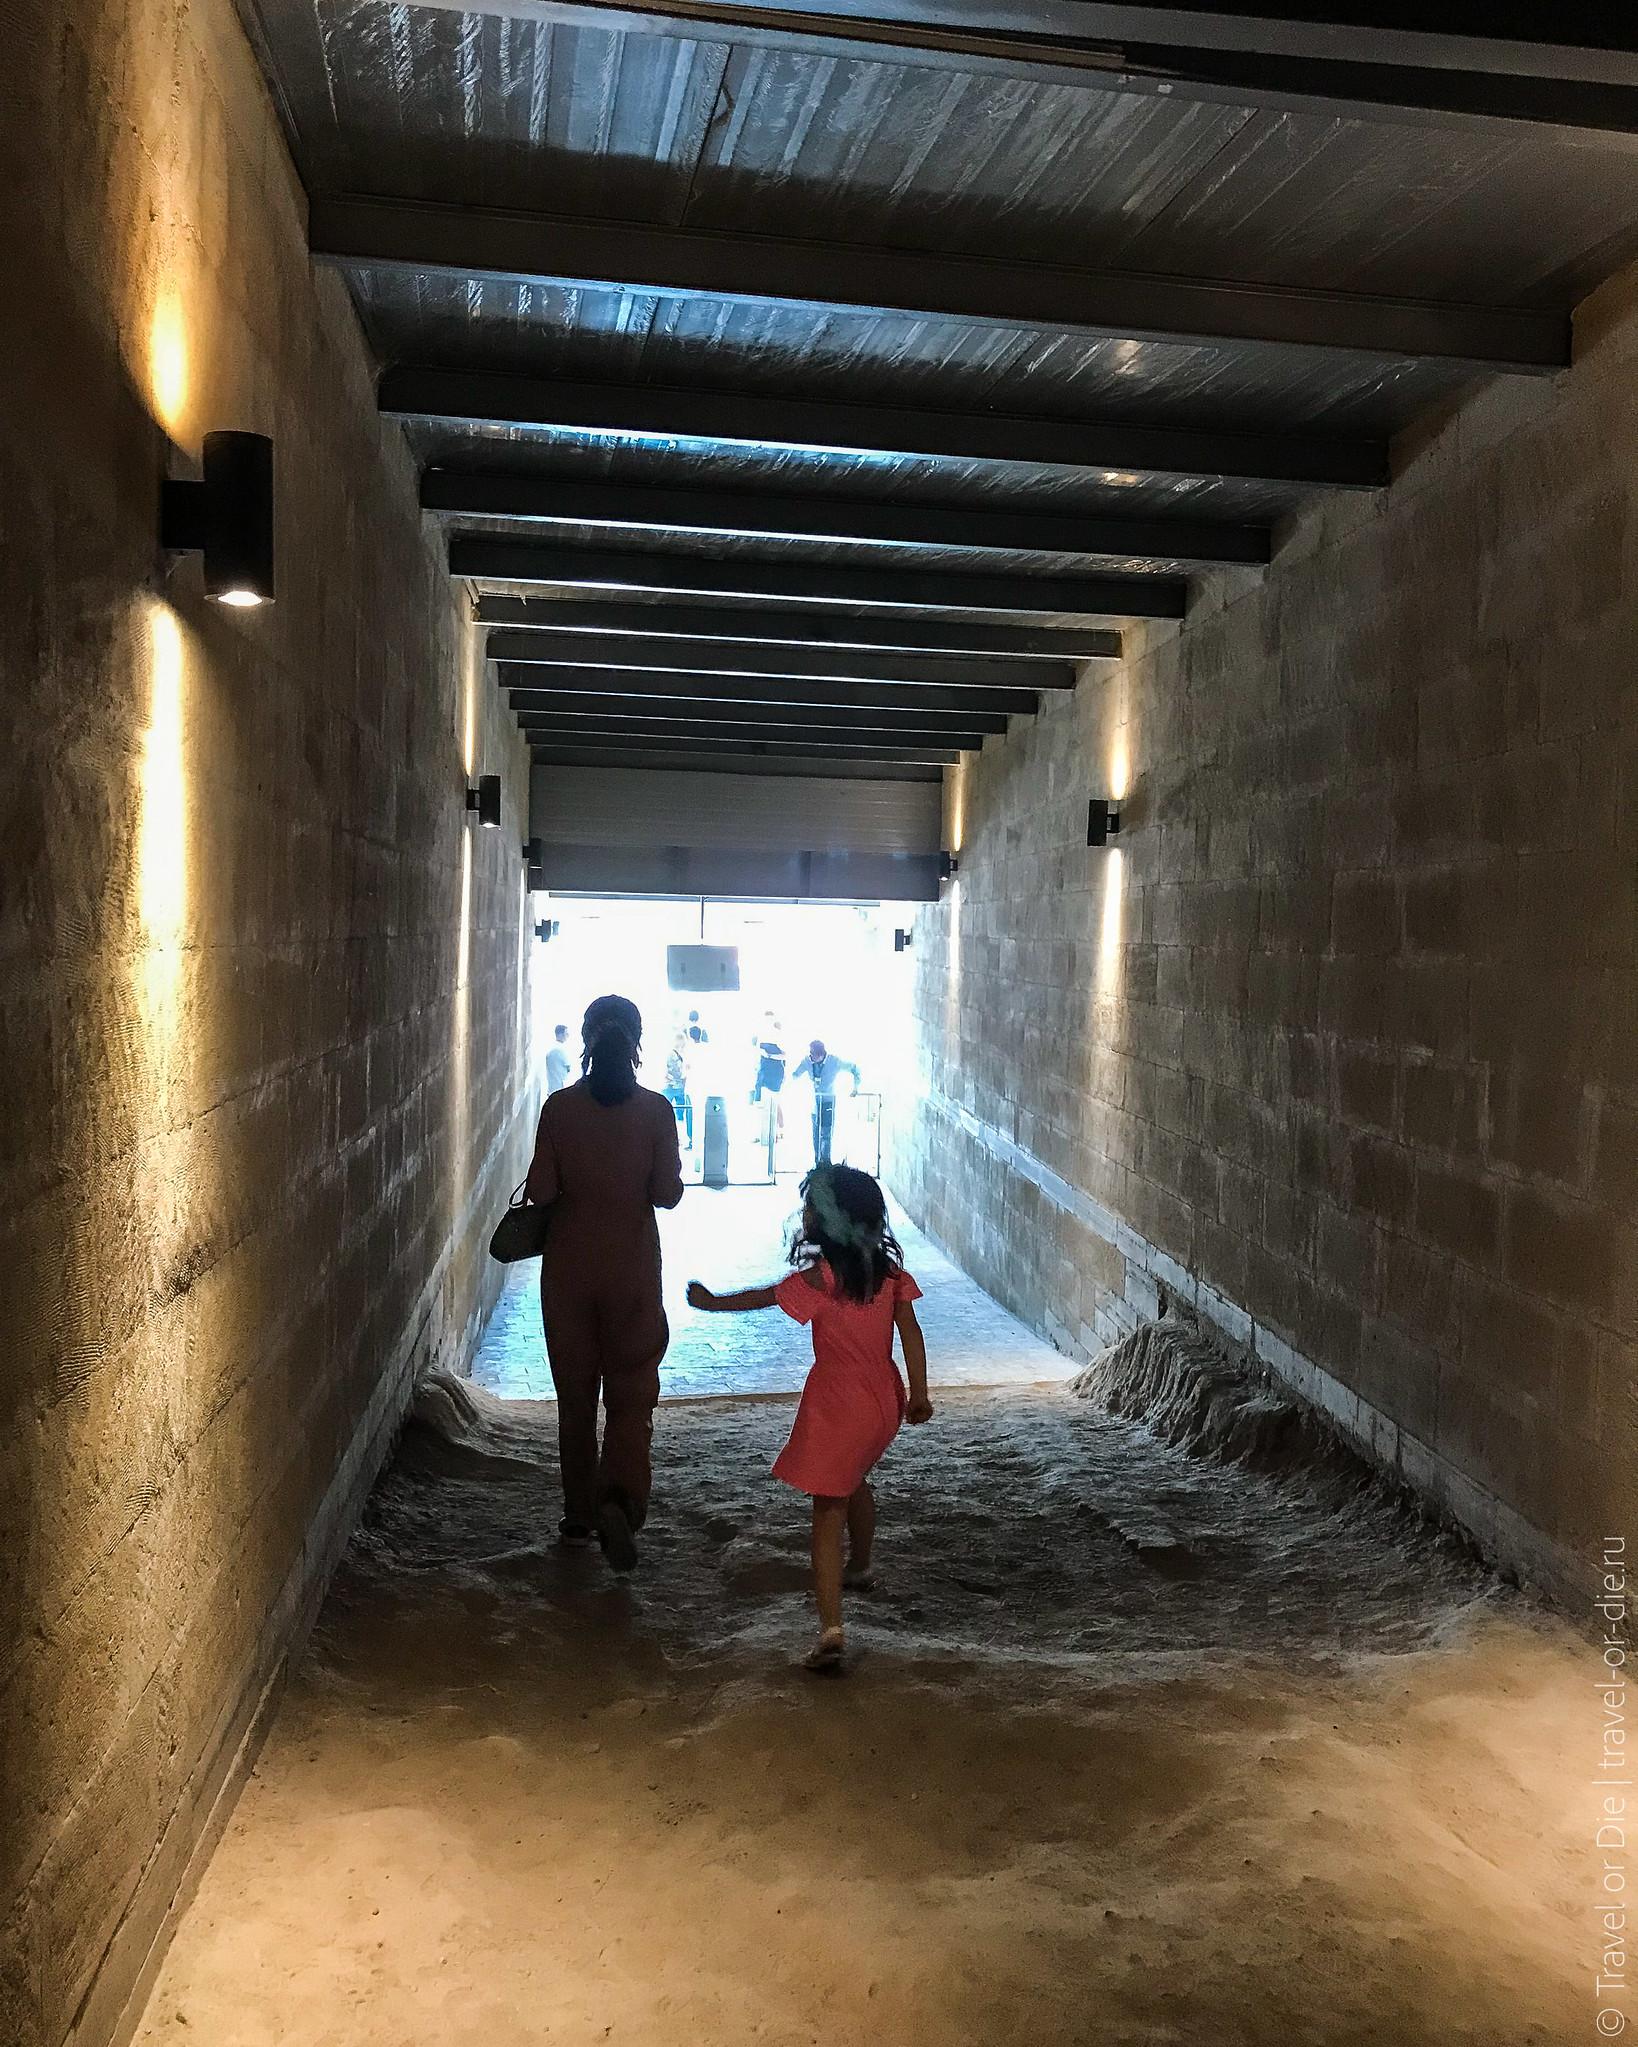 Kaymakli-Underground-City-Cappadocia-8292